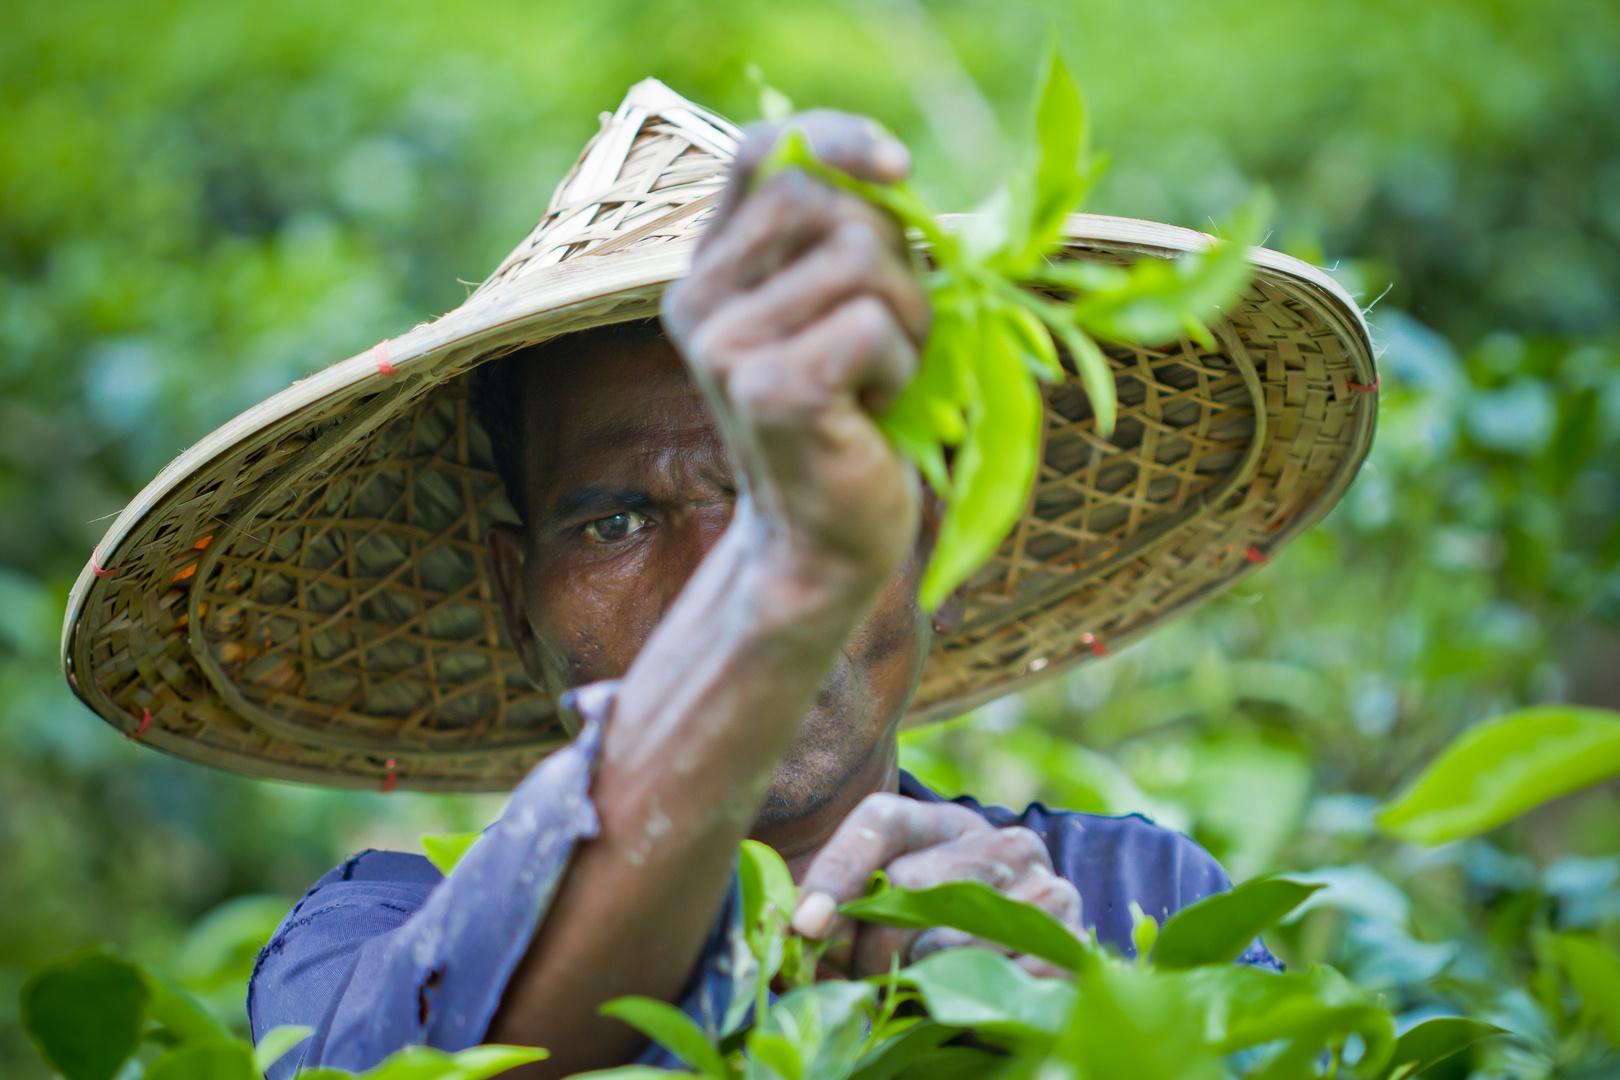 A Tea plantation Worker closeup.